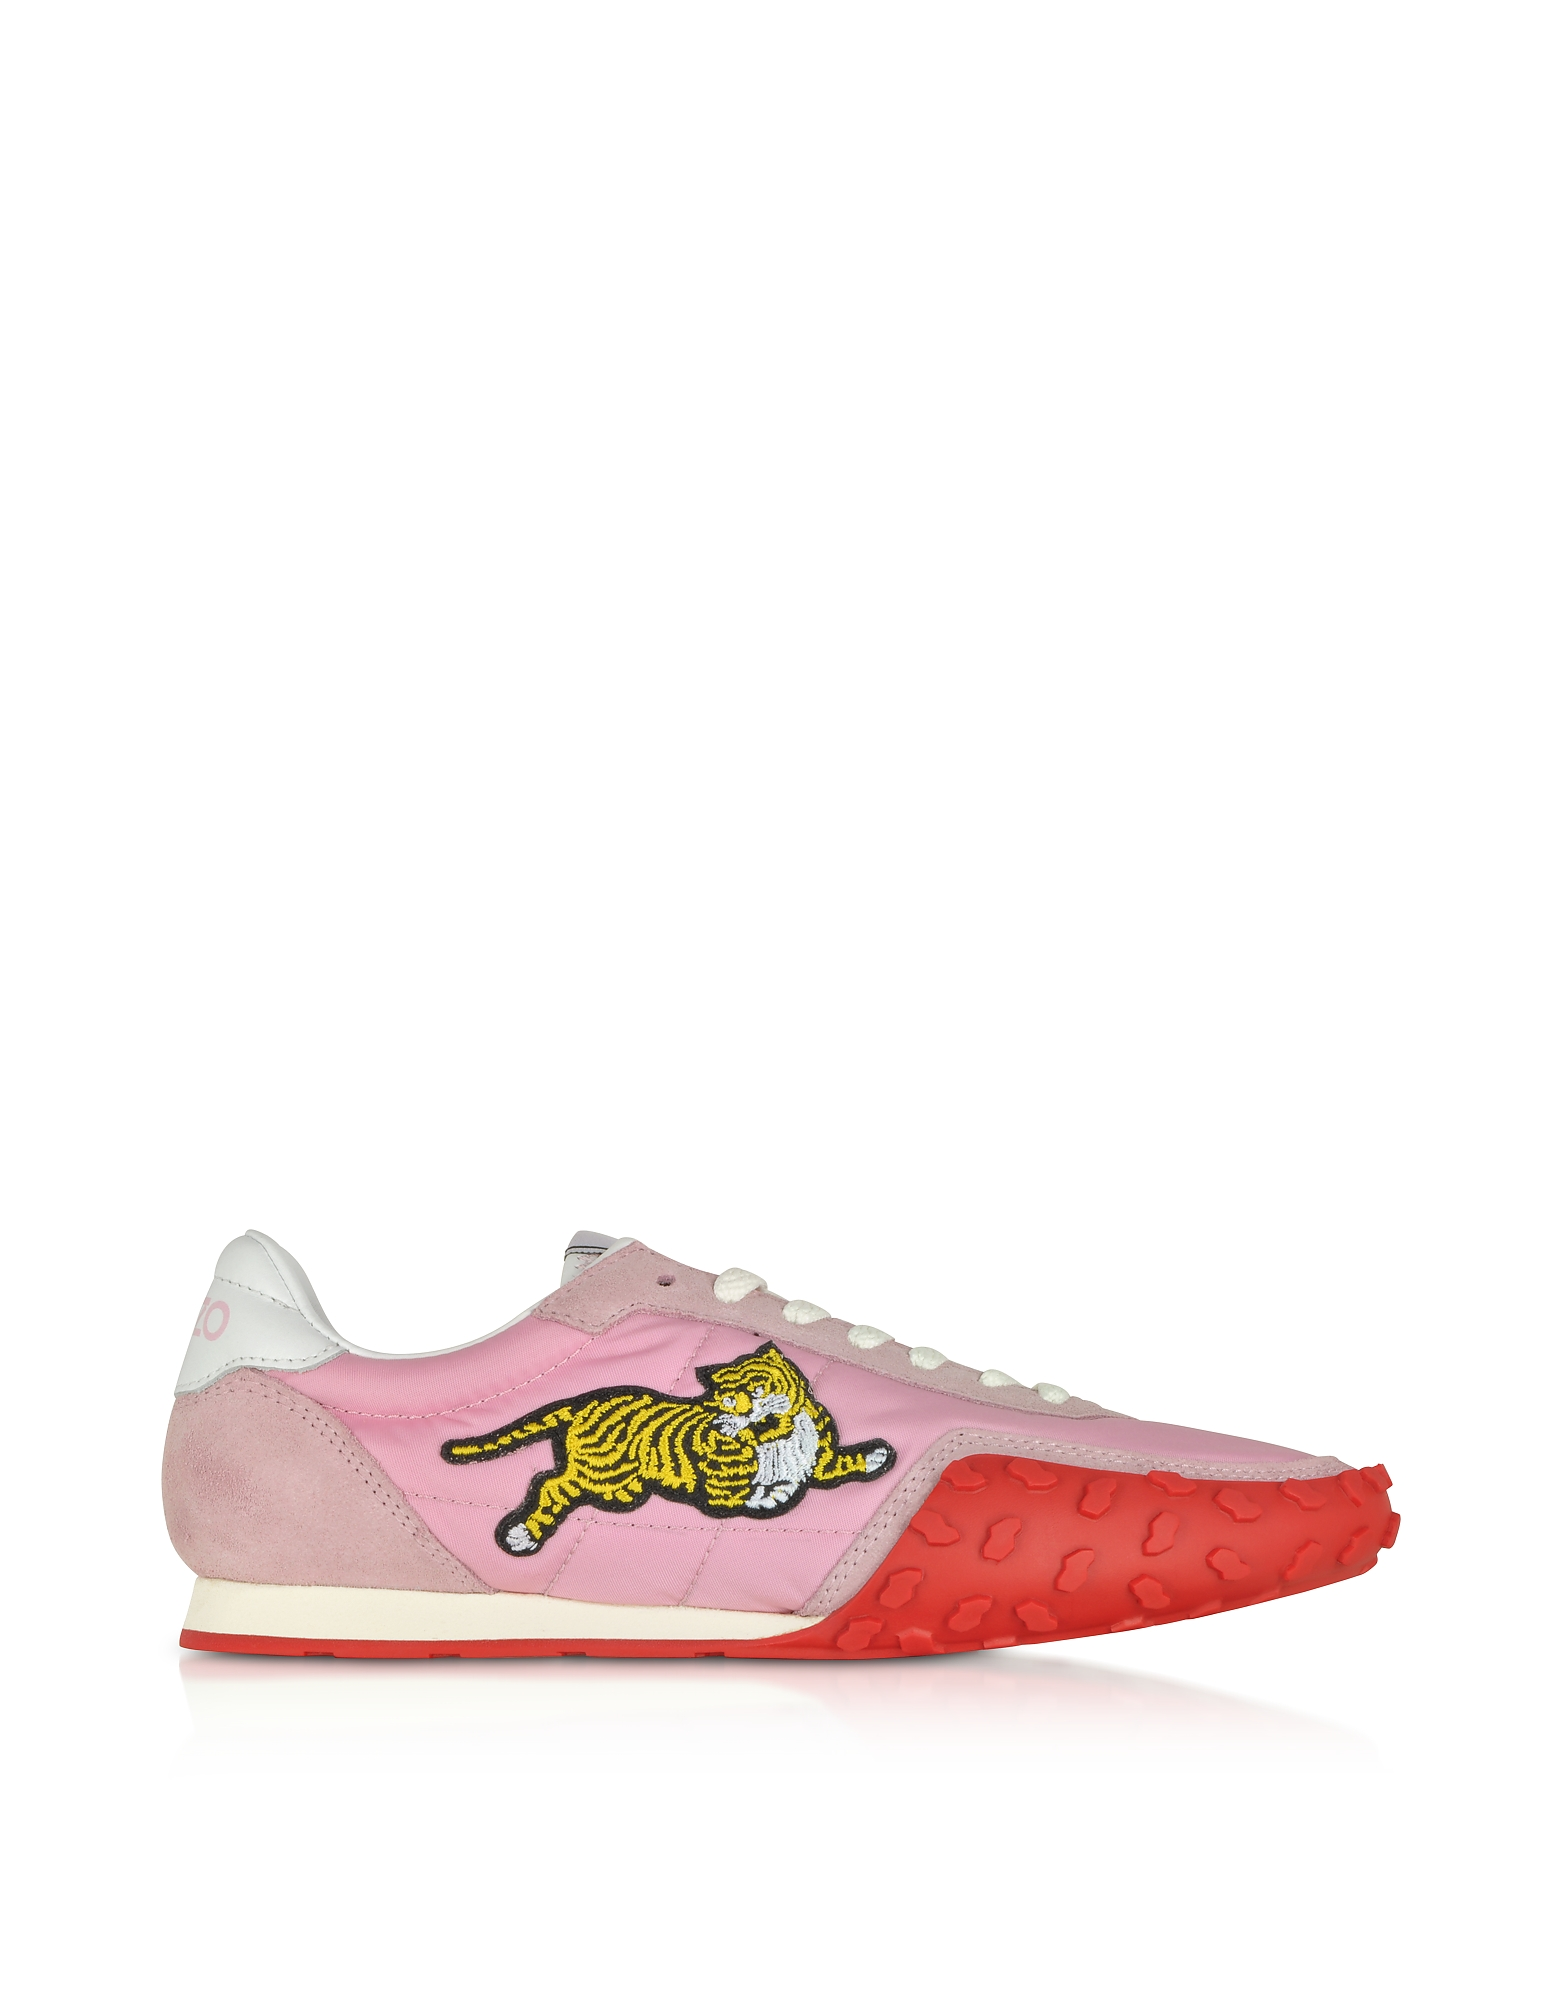 Kenzo Designer Shoes, Pastel Pink Nylon Kenzo Move Women's Sneakers